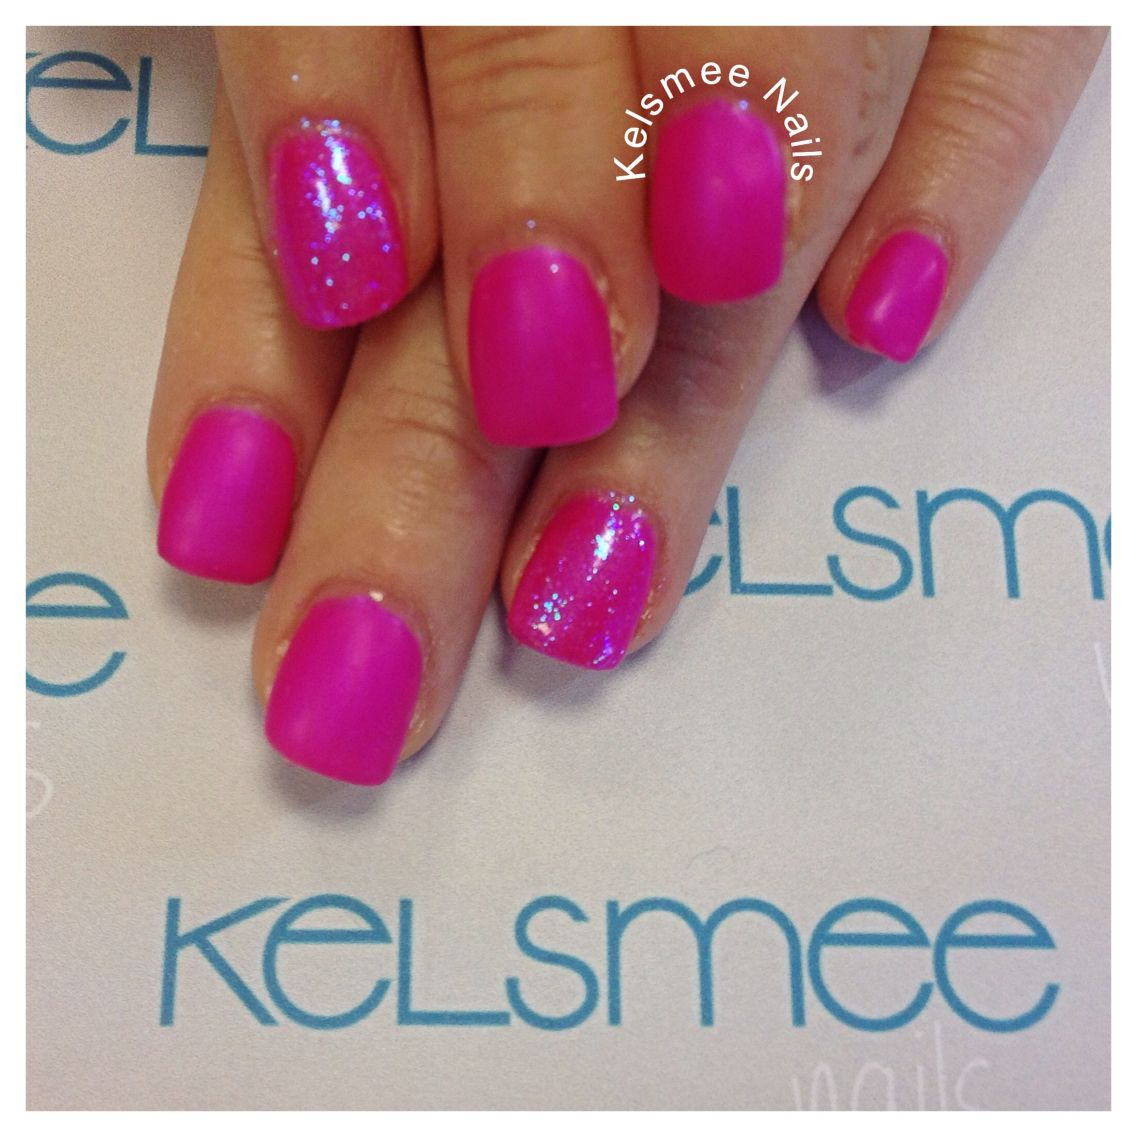 Young Nails maniq overlay pink matte Nails | Nails | Pinterest ...